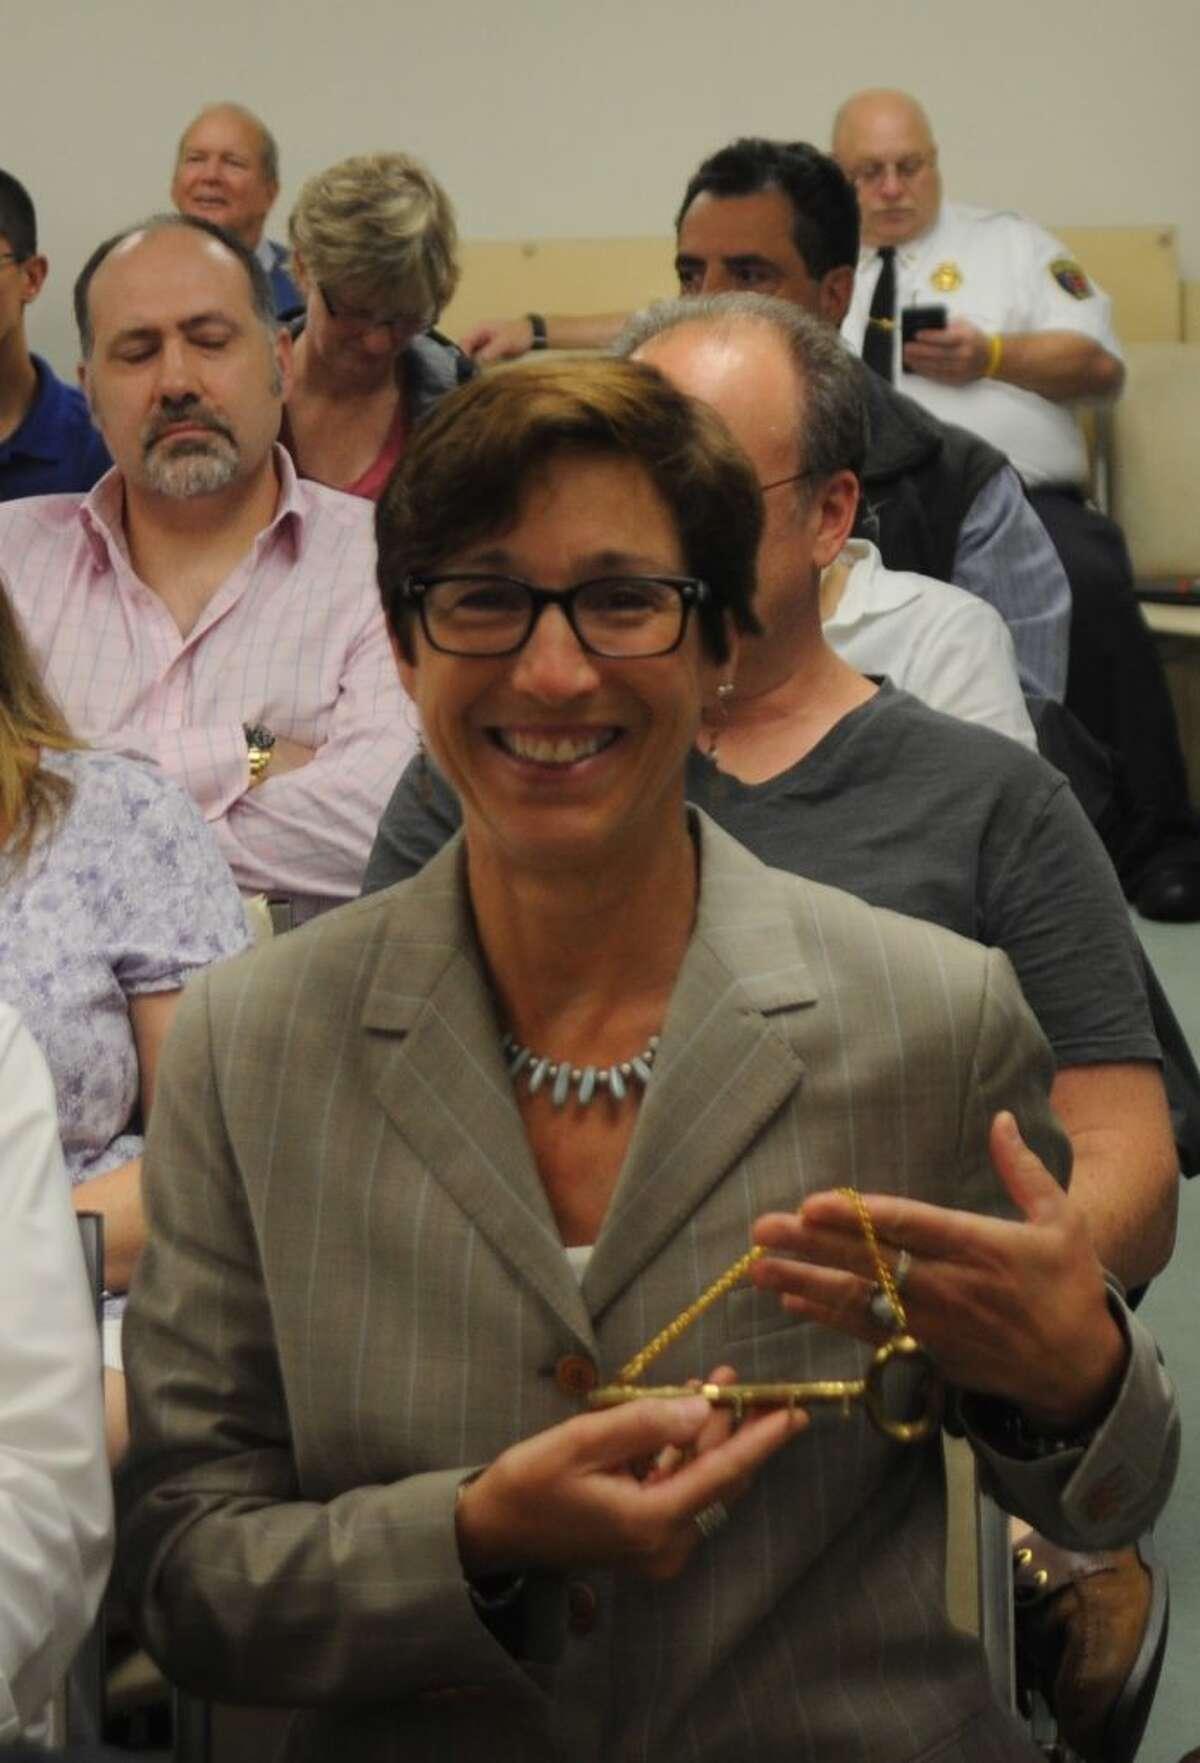 Wendy Lionetti, new town clerk, displays the ceremonial